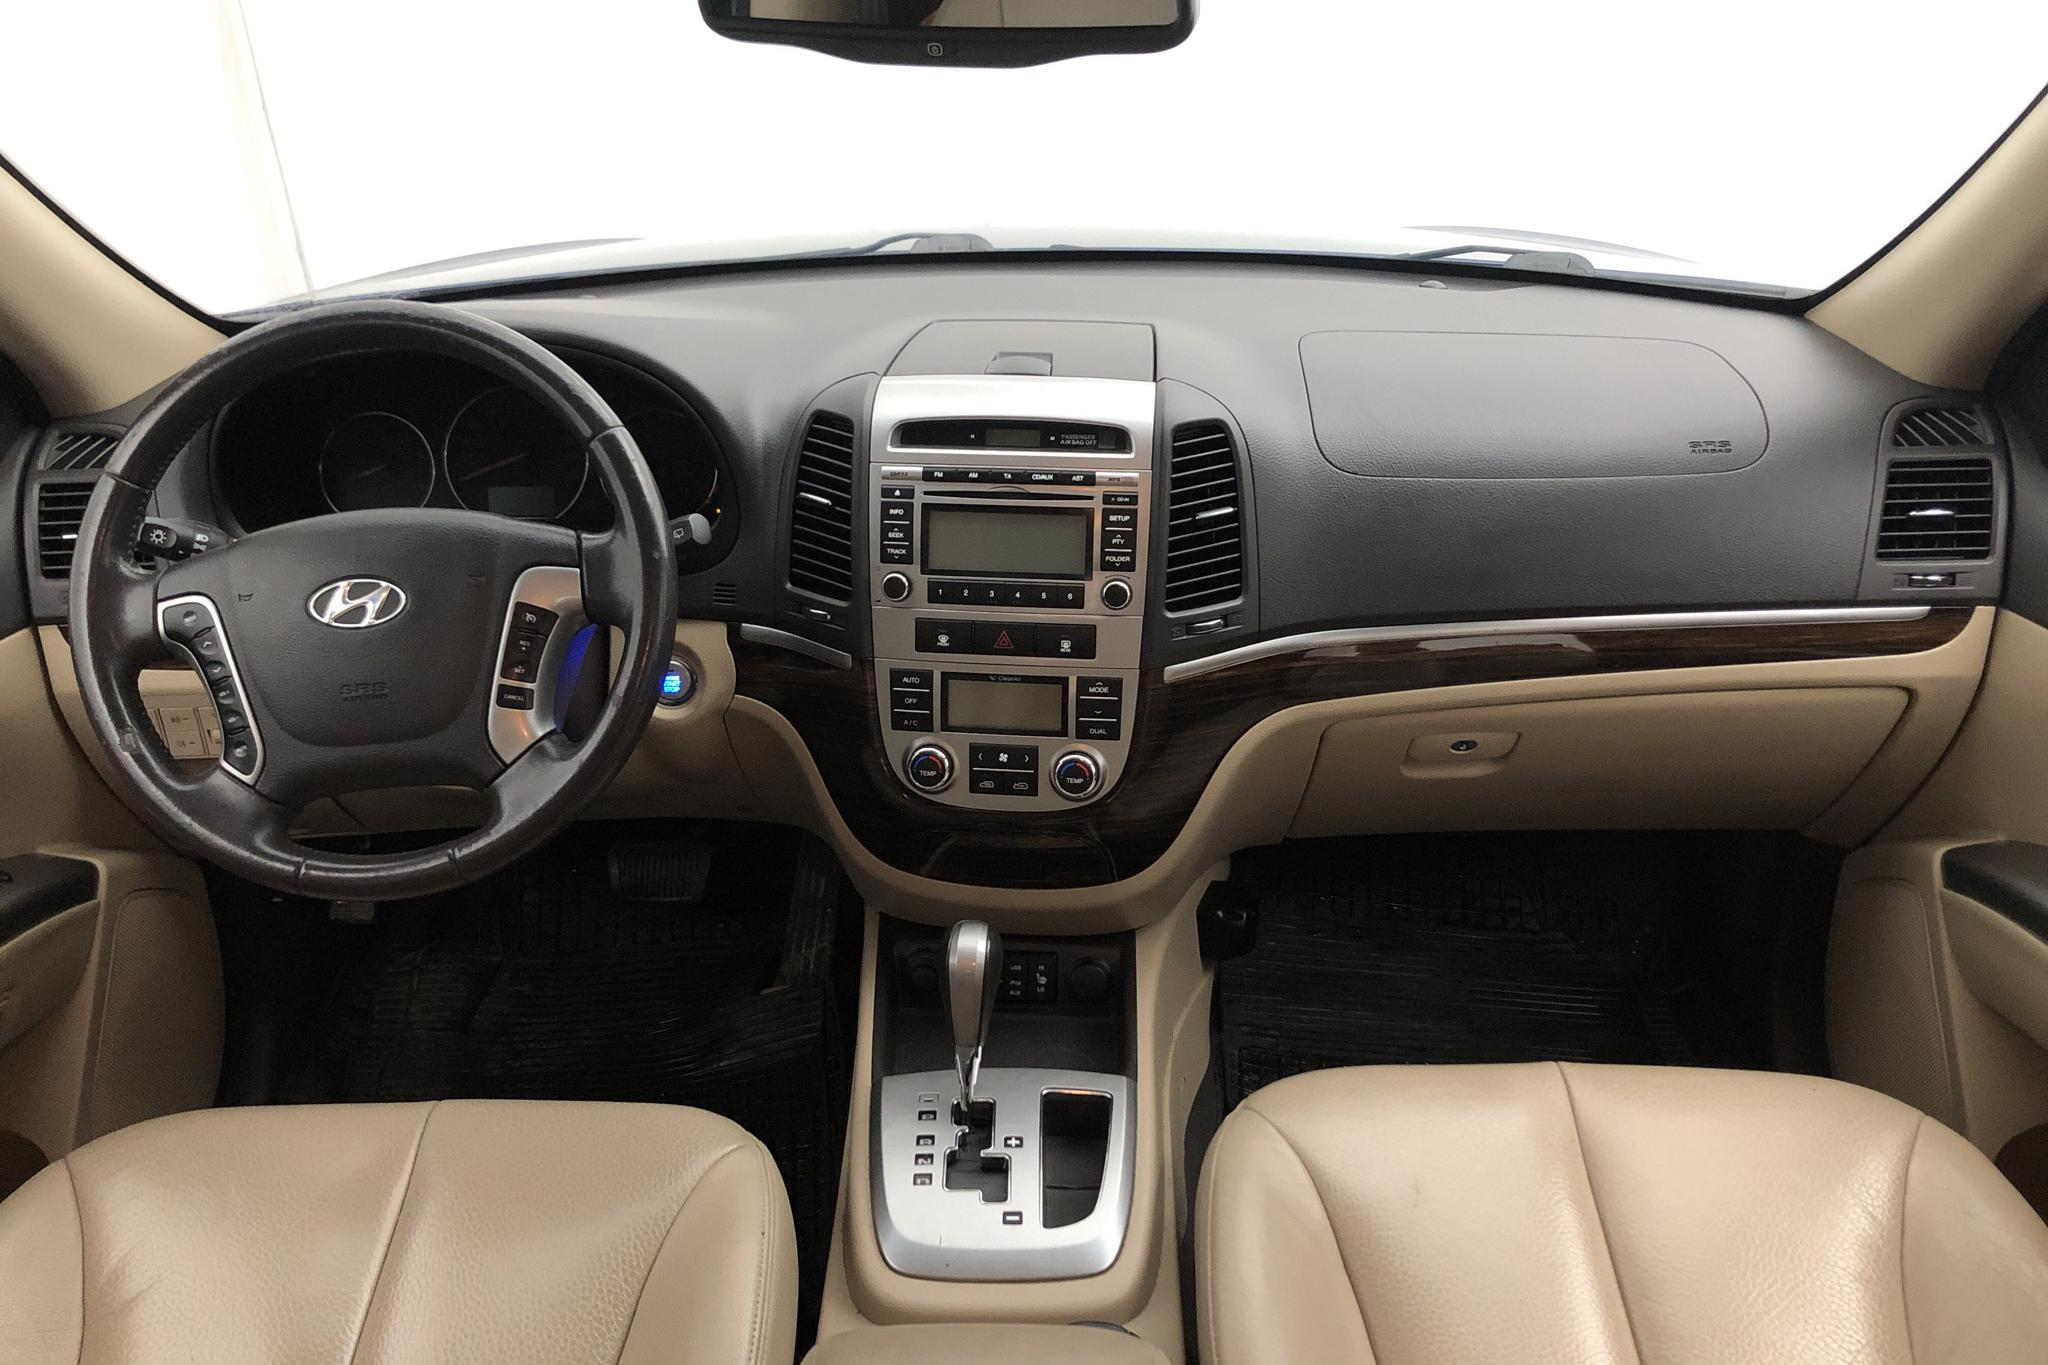 Hyundai Santa Fé 2.2 CRDi-R (197hk) - 9 974 mil - Automat - blå - 2010